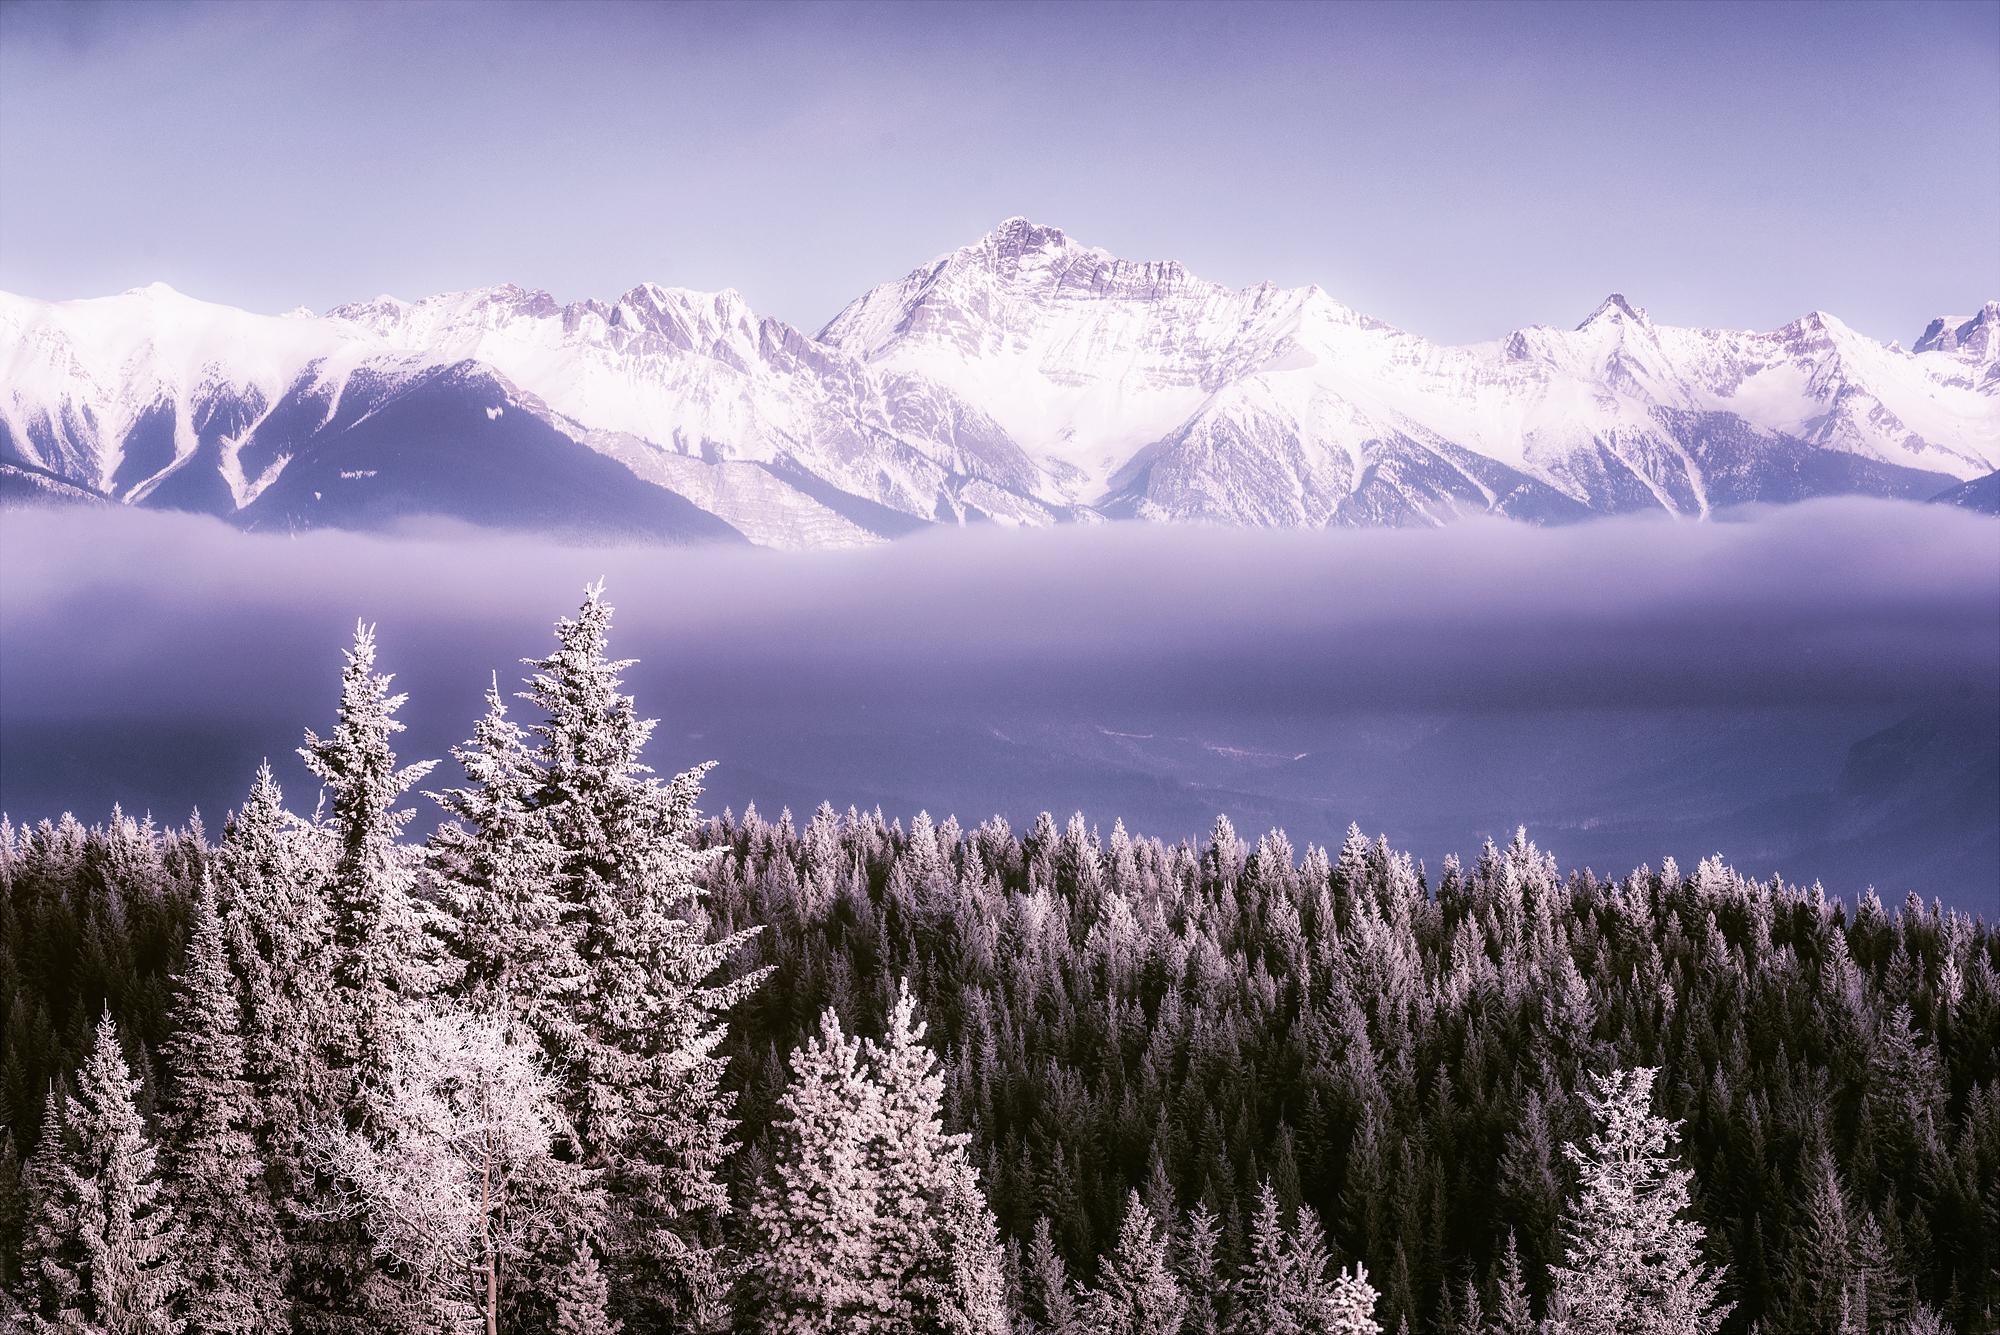 Atmospherics_Frosted_Tree_Tops_Distant_Peaks_2000px.jpg